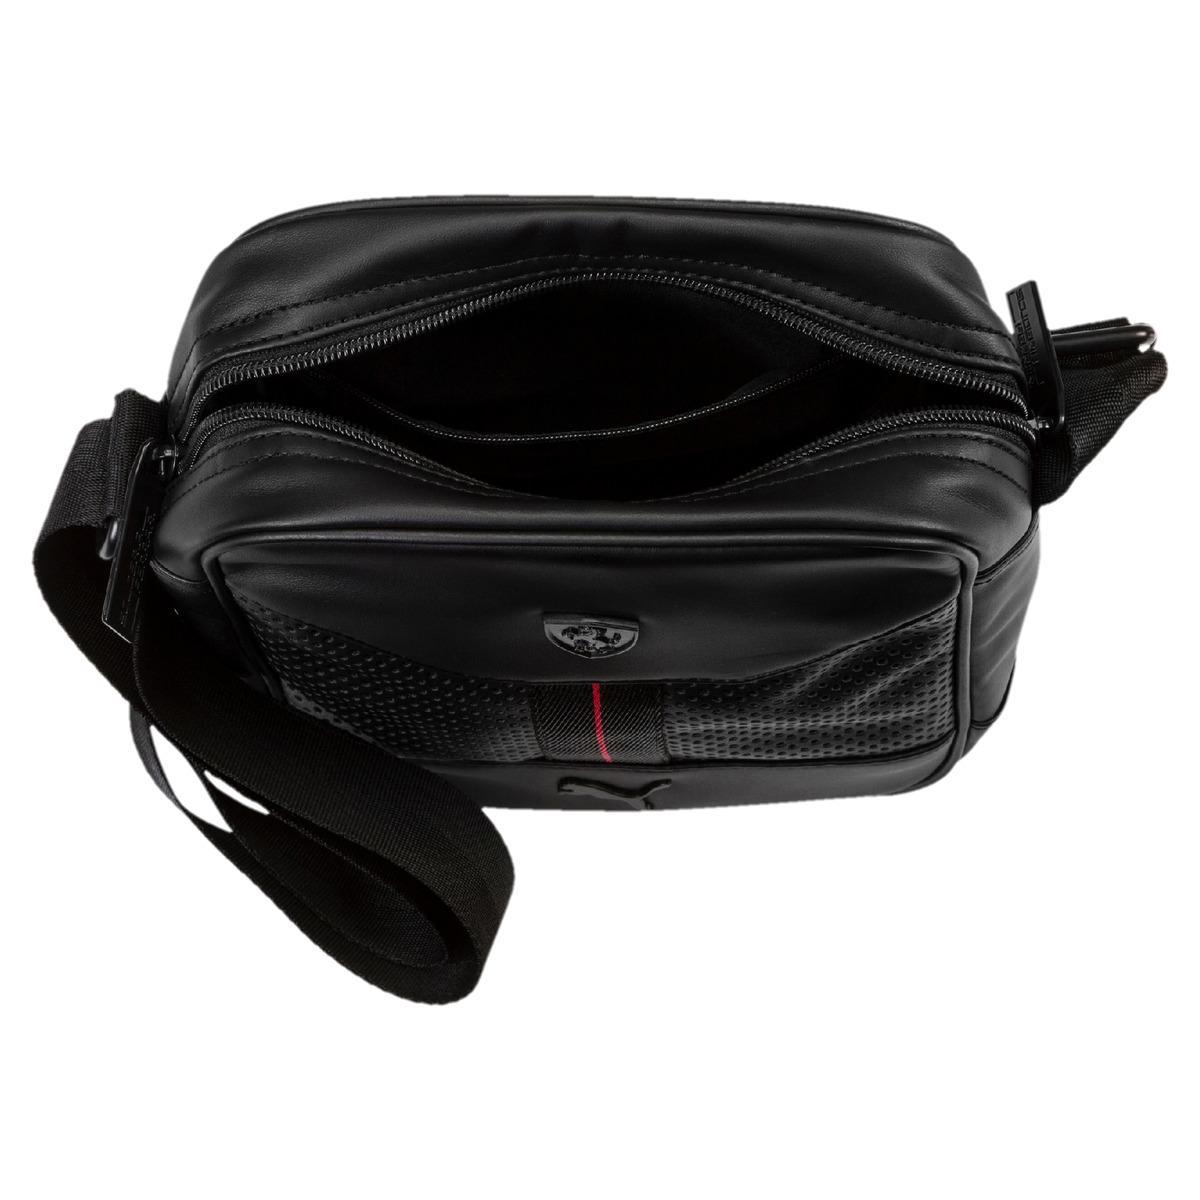 Puma Ferrari Portable Bag in Black for Men - Lyst 465b9371e4d2e